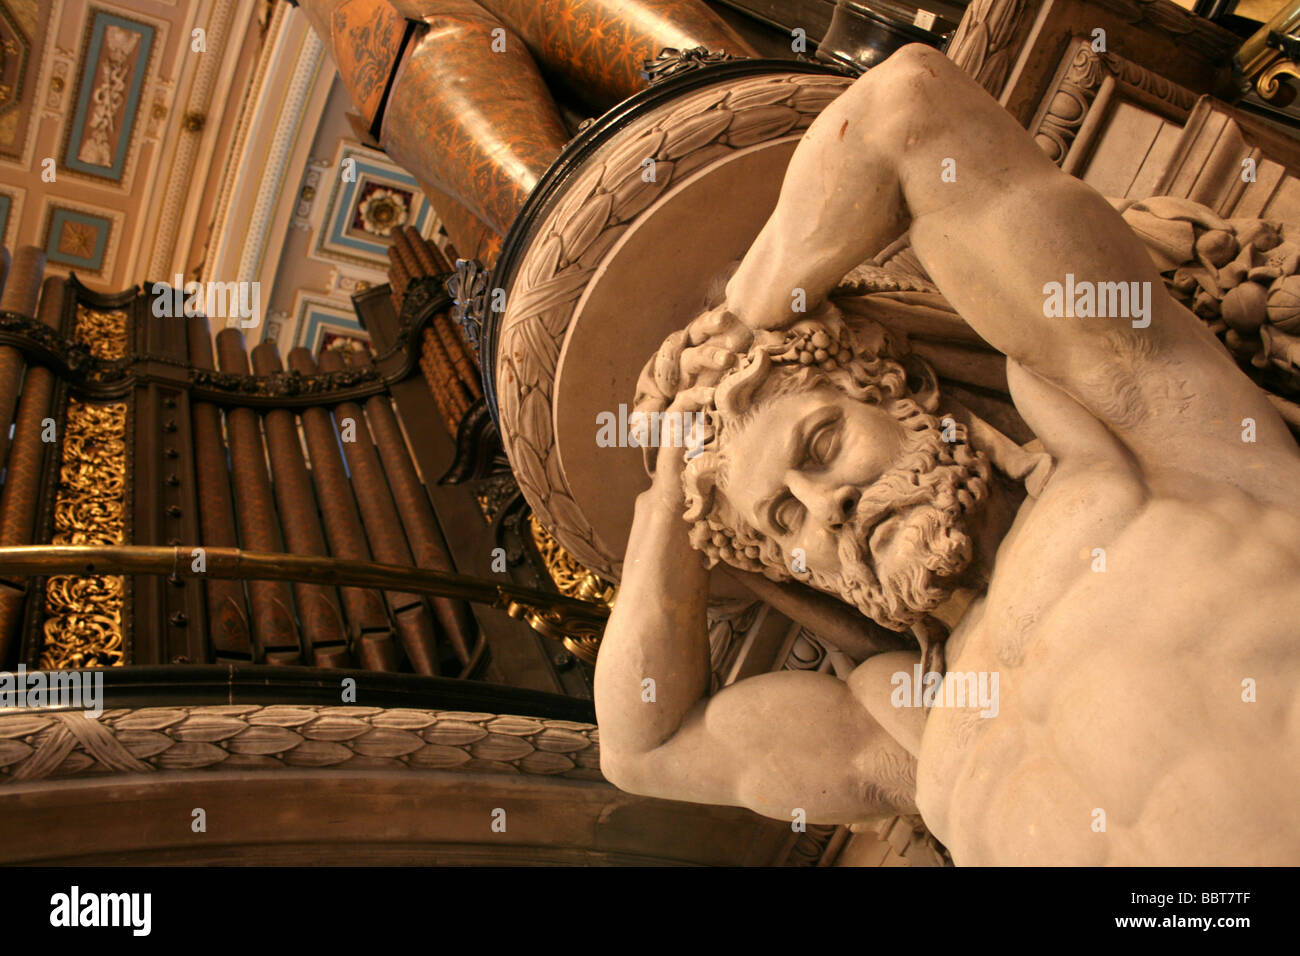 Marble Sculpture Of Hercules, St George's Hall, Liverpool, Merseyside, UK Stock Photo